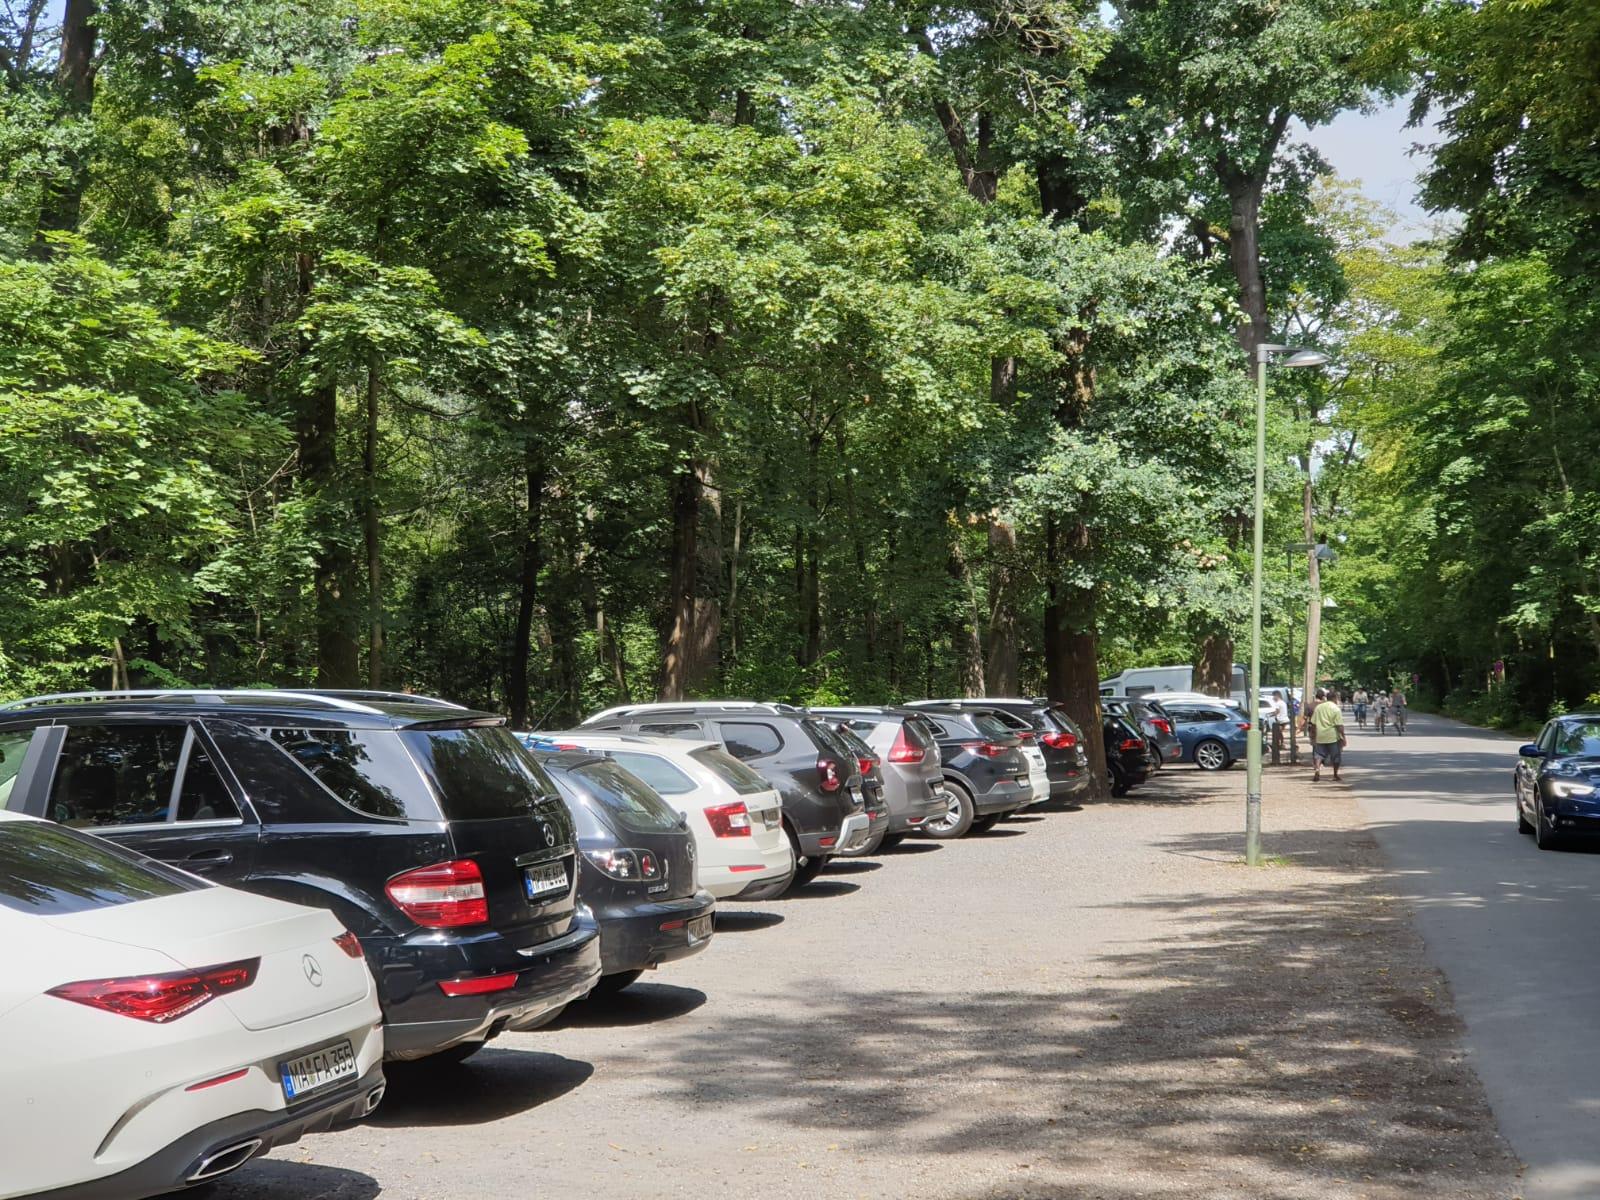 Nutzung des Käfertaler Waldes als Naherholungsgebiet